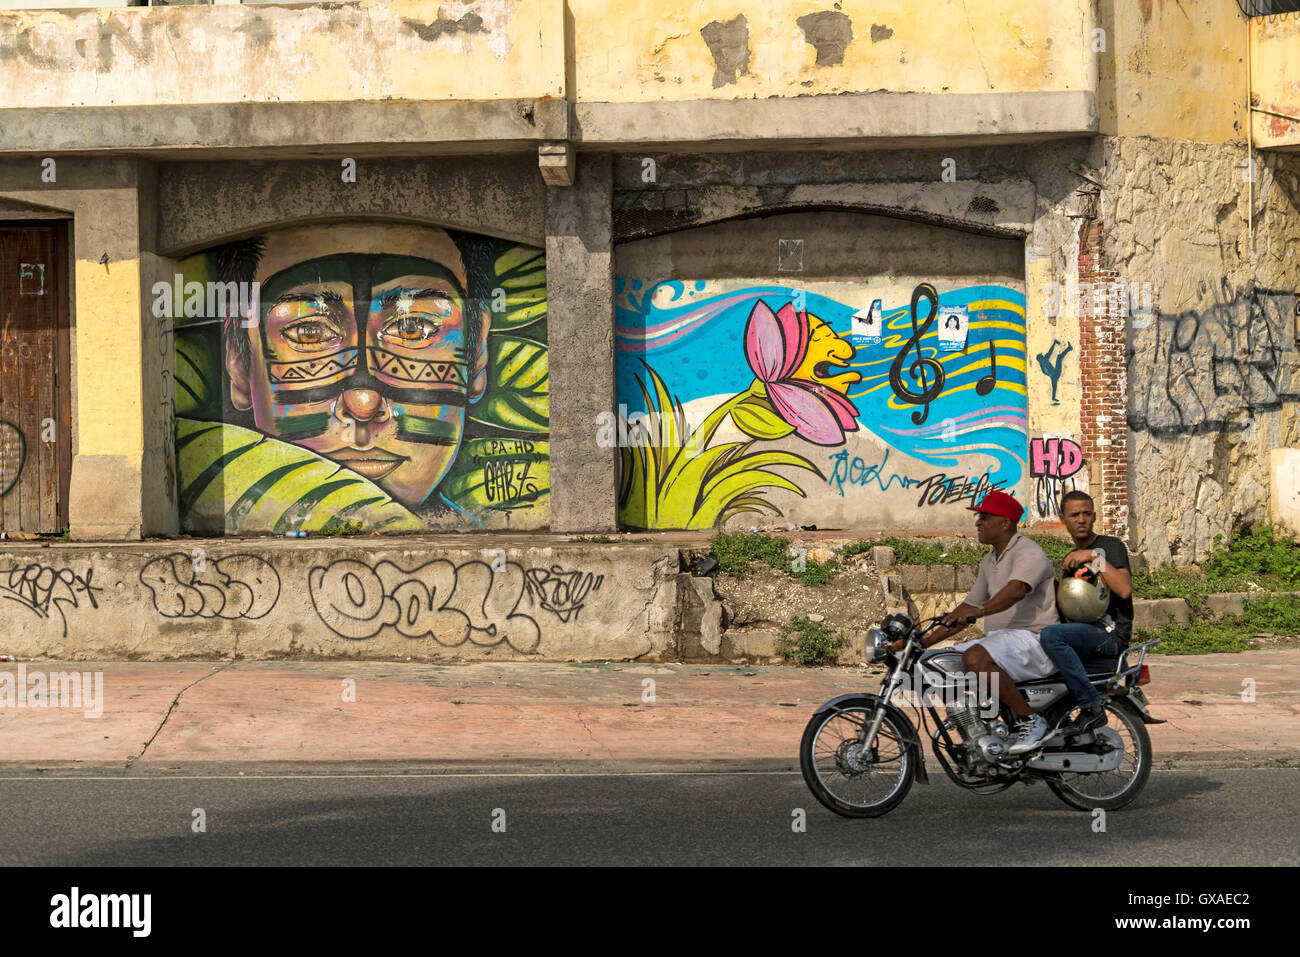 Graffiti in der Altstadt, Zona Colonial, Hauptstadt Santo Domingo, Dominikanische Republik, Karibik, Amerika | Graffiti, Stock Photo